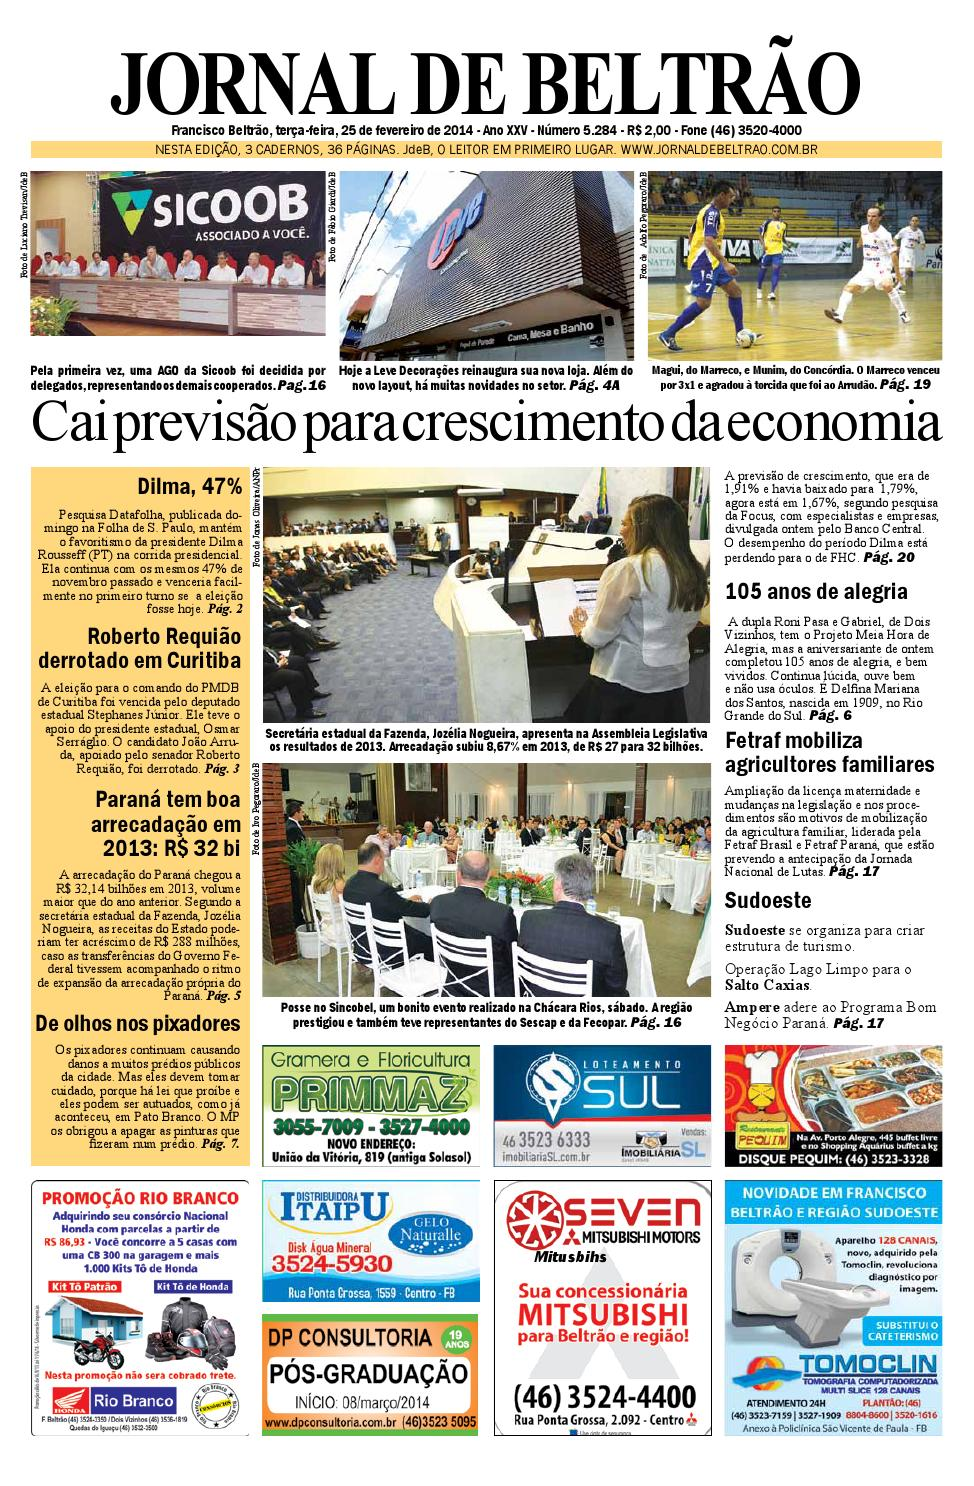 jornaldebeltrão 5284 2014-02-25.pdf by Orangotoe - issuu 69afa8900dc51